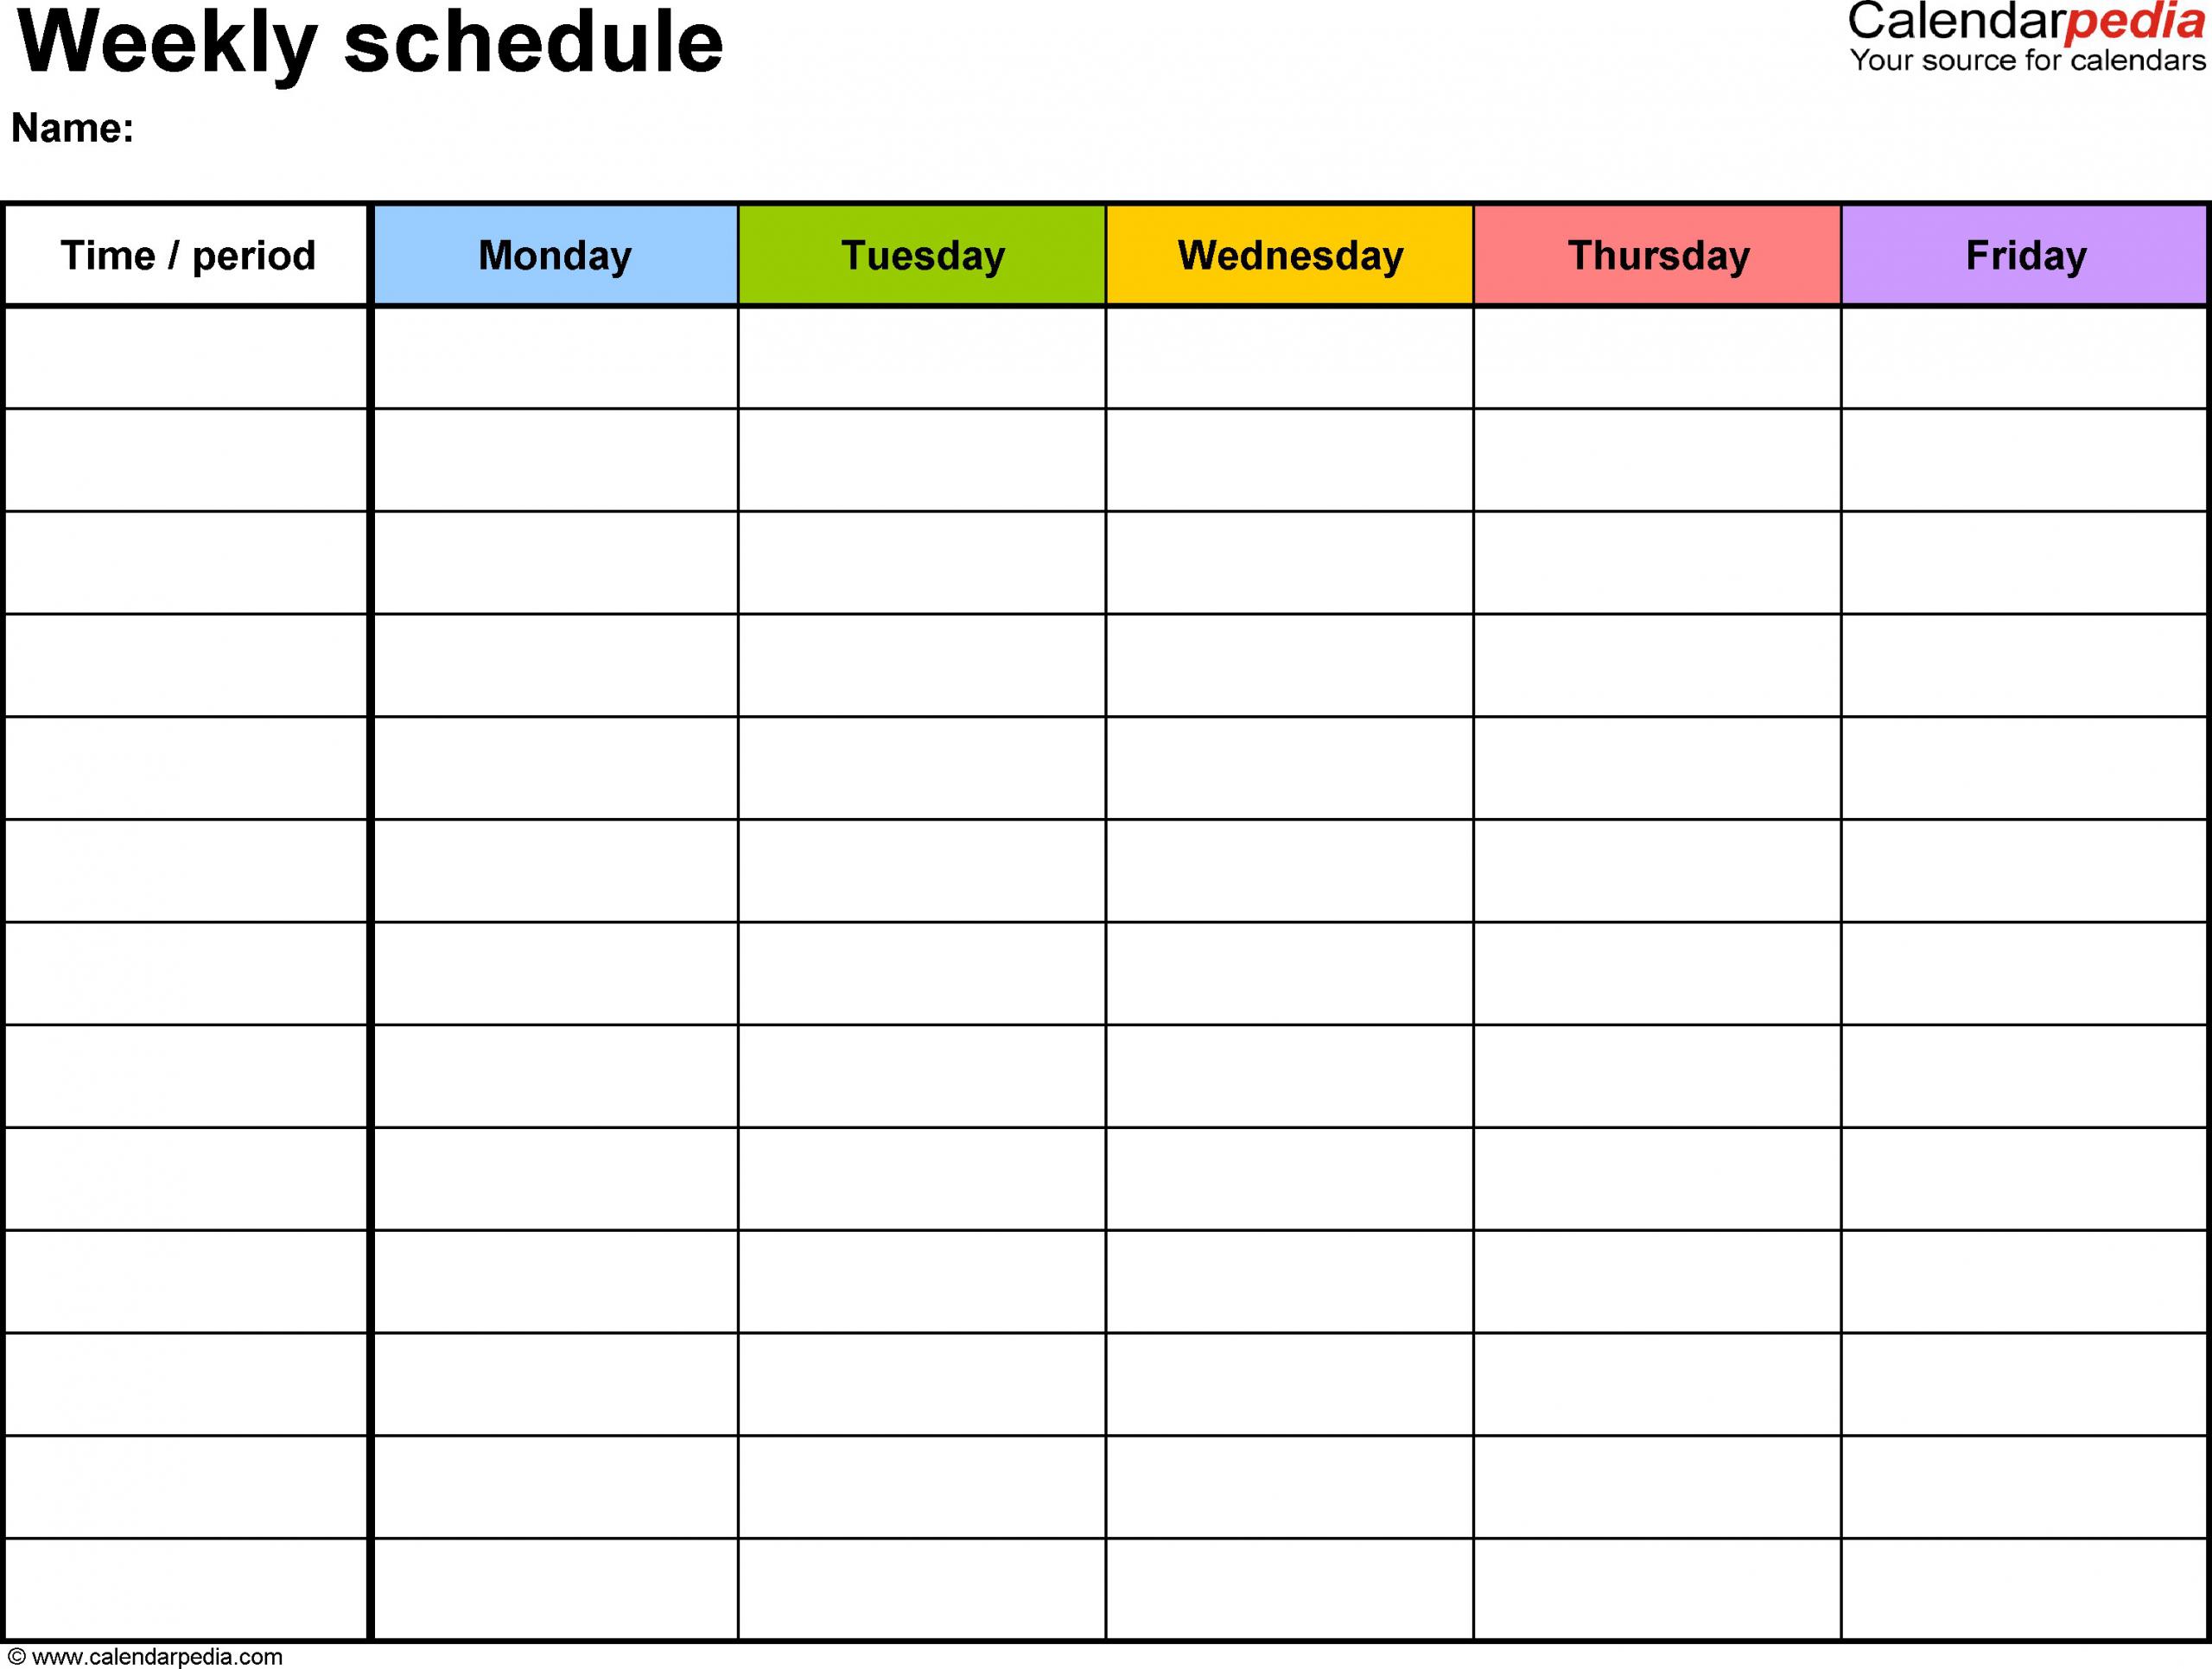 Monday Friday Calendar In 2020 | Daily Schedule Template Monday Through Sunday Calendar Word